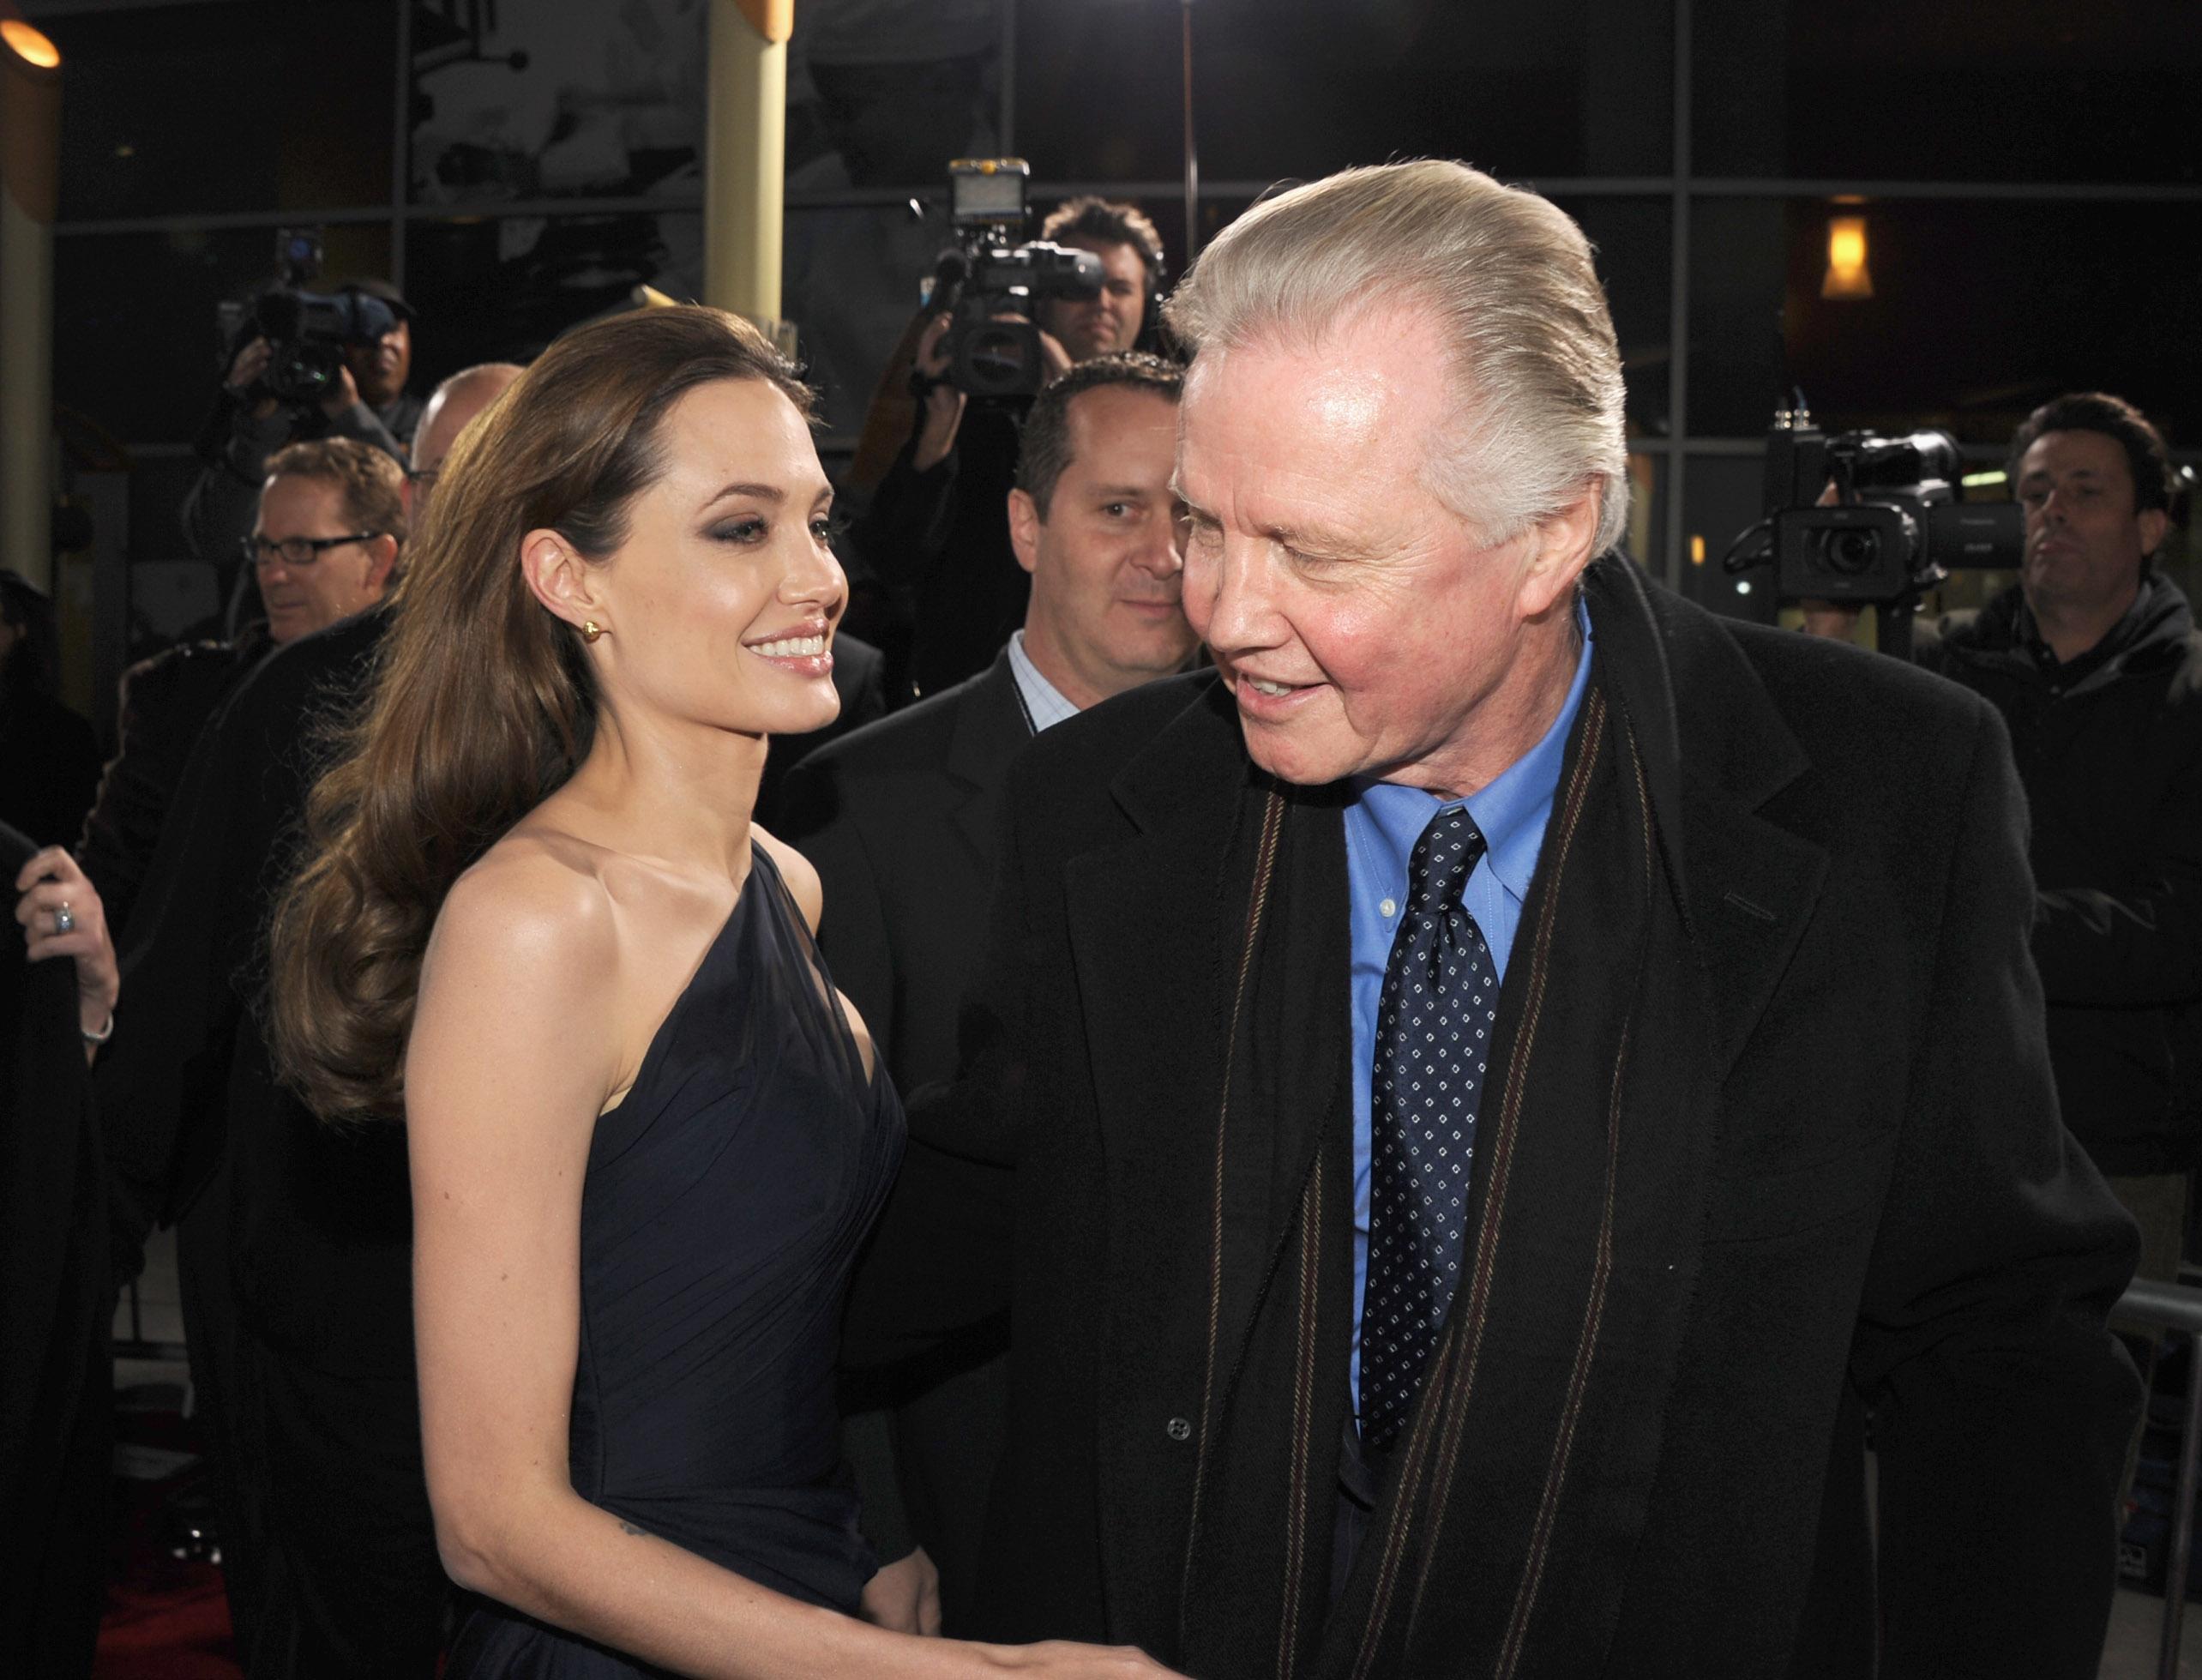 Angelina Jolie and Jon Voigt